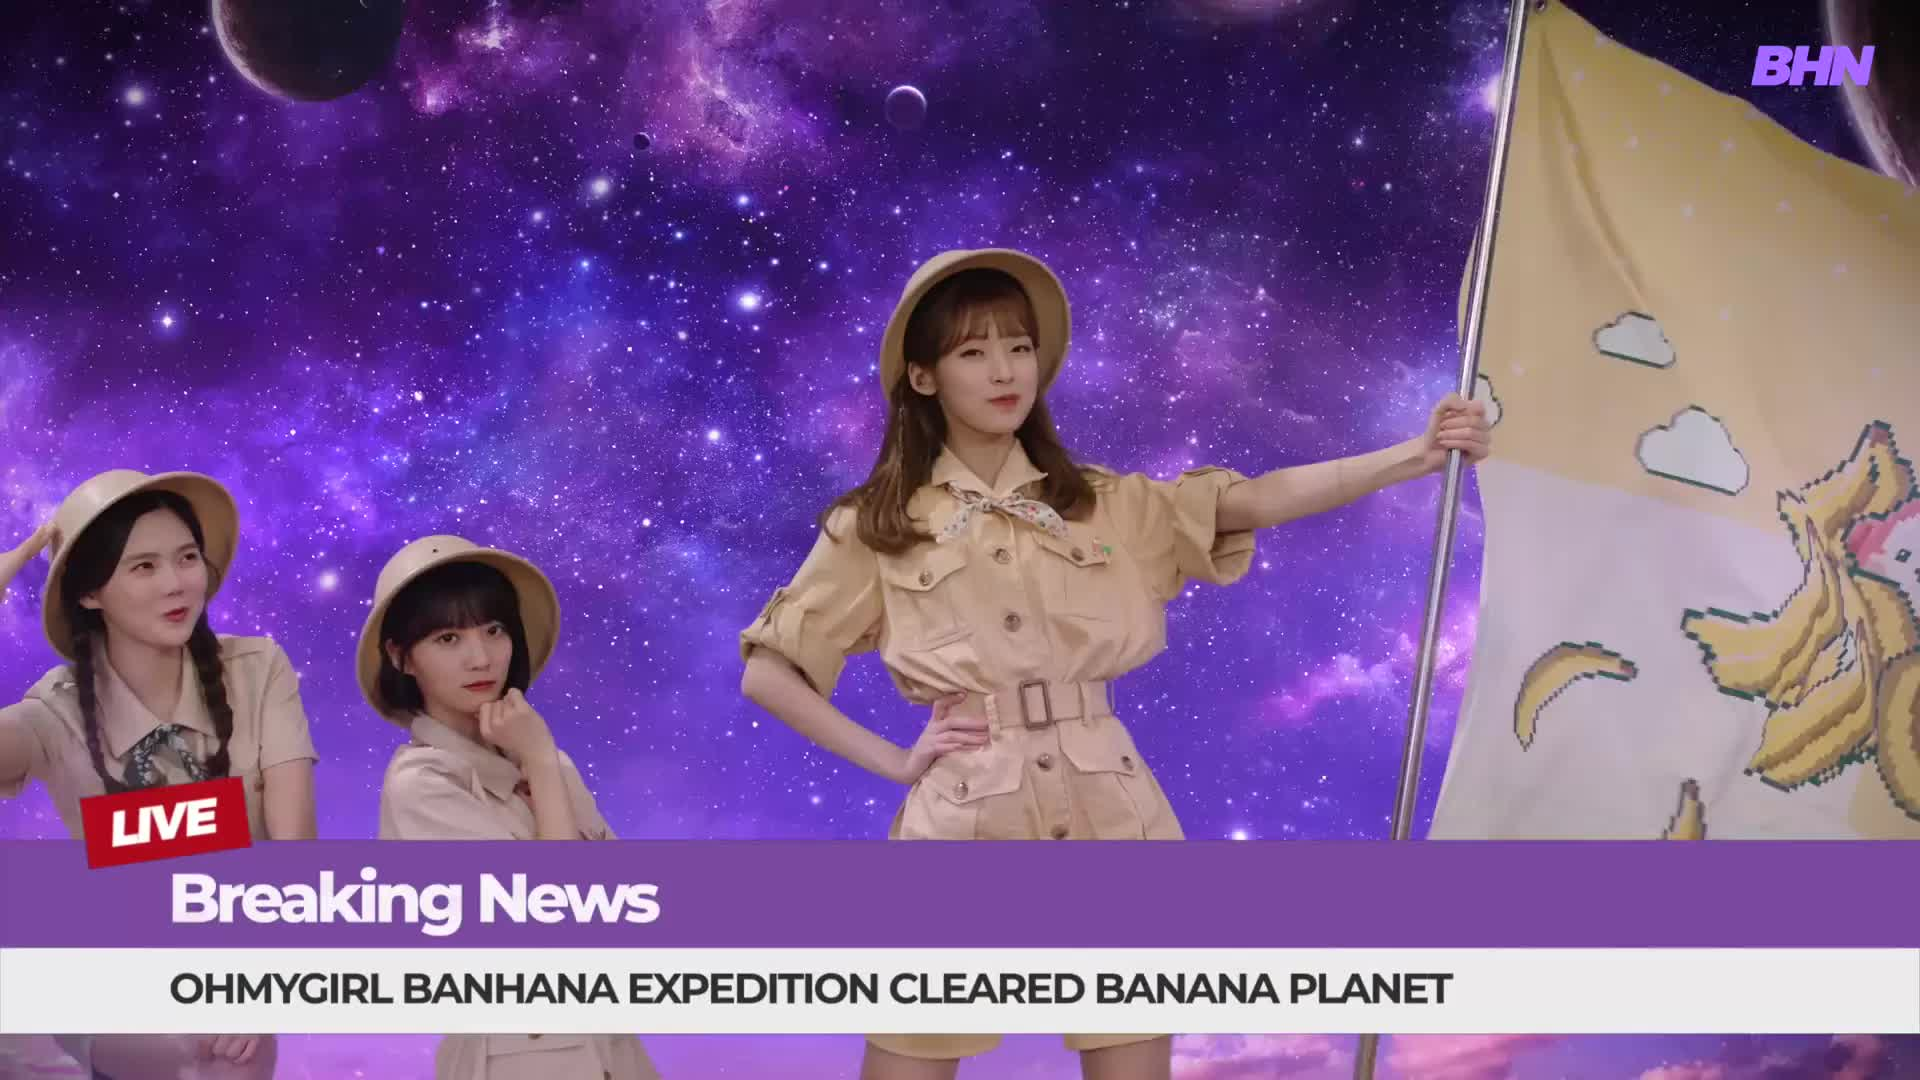 [MV] OH MY GIRL BANHANA(오마이걸 반하나) Banana allergy monkey(바나나 알러지 원숭이) GIFs